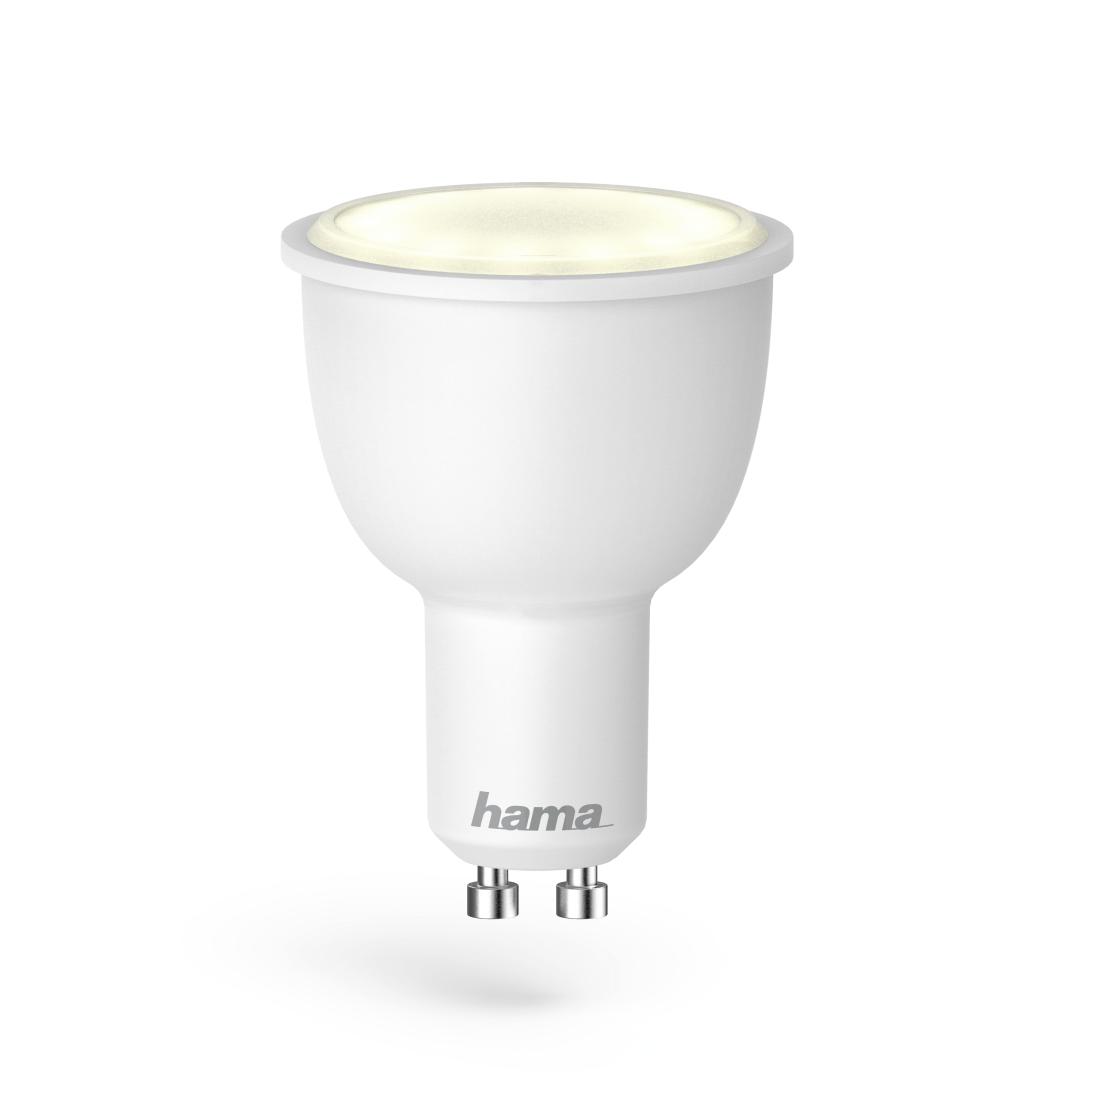 00176532 hama wifi led lampe gu10 4 5w rgb dimmbar hama de. Black Bedroom Furniture Sets. Home Design Ideas